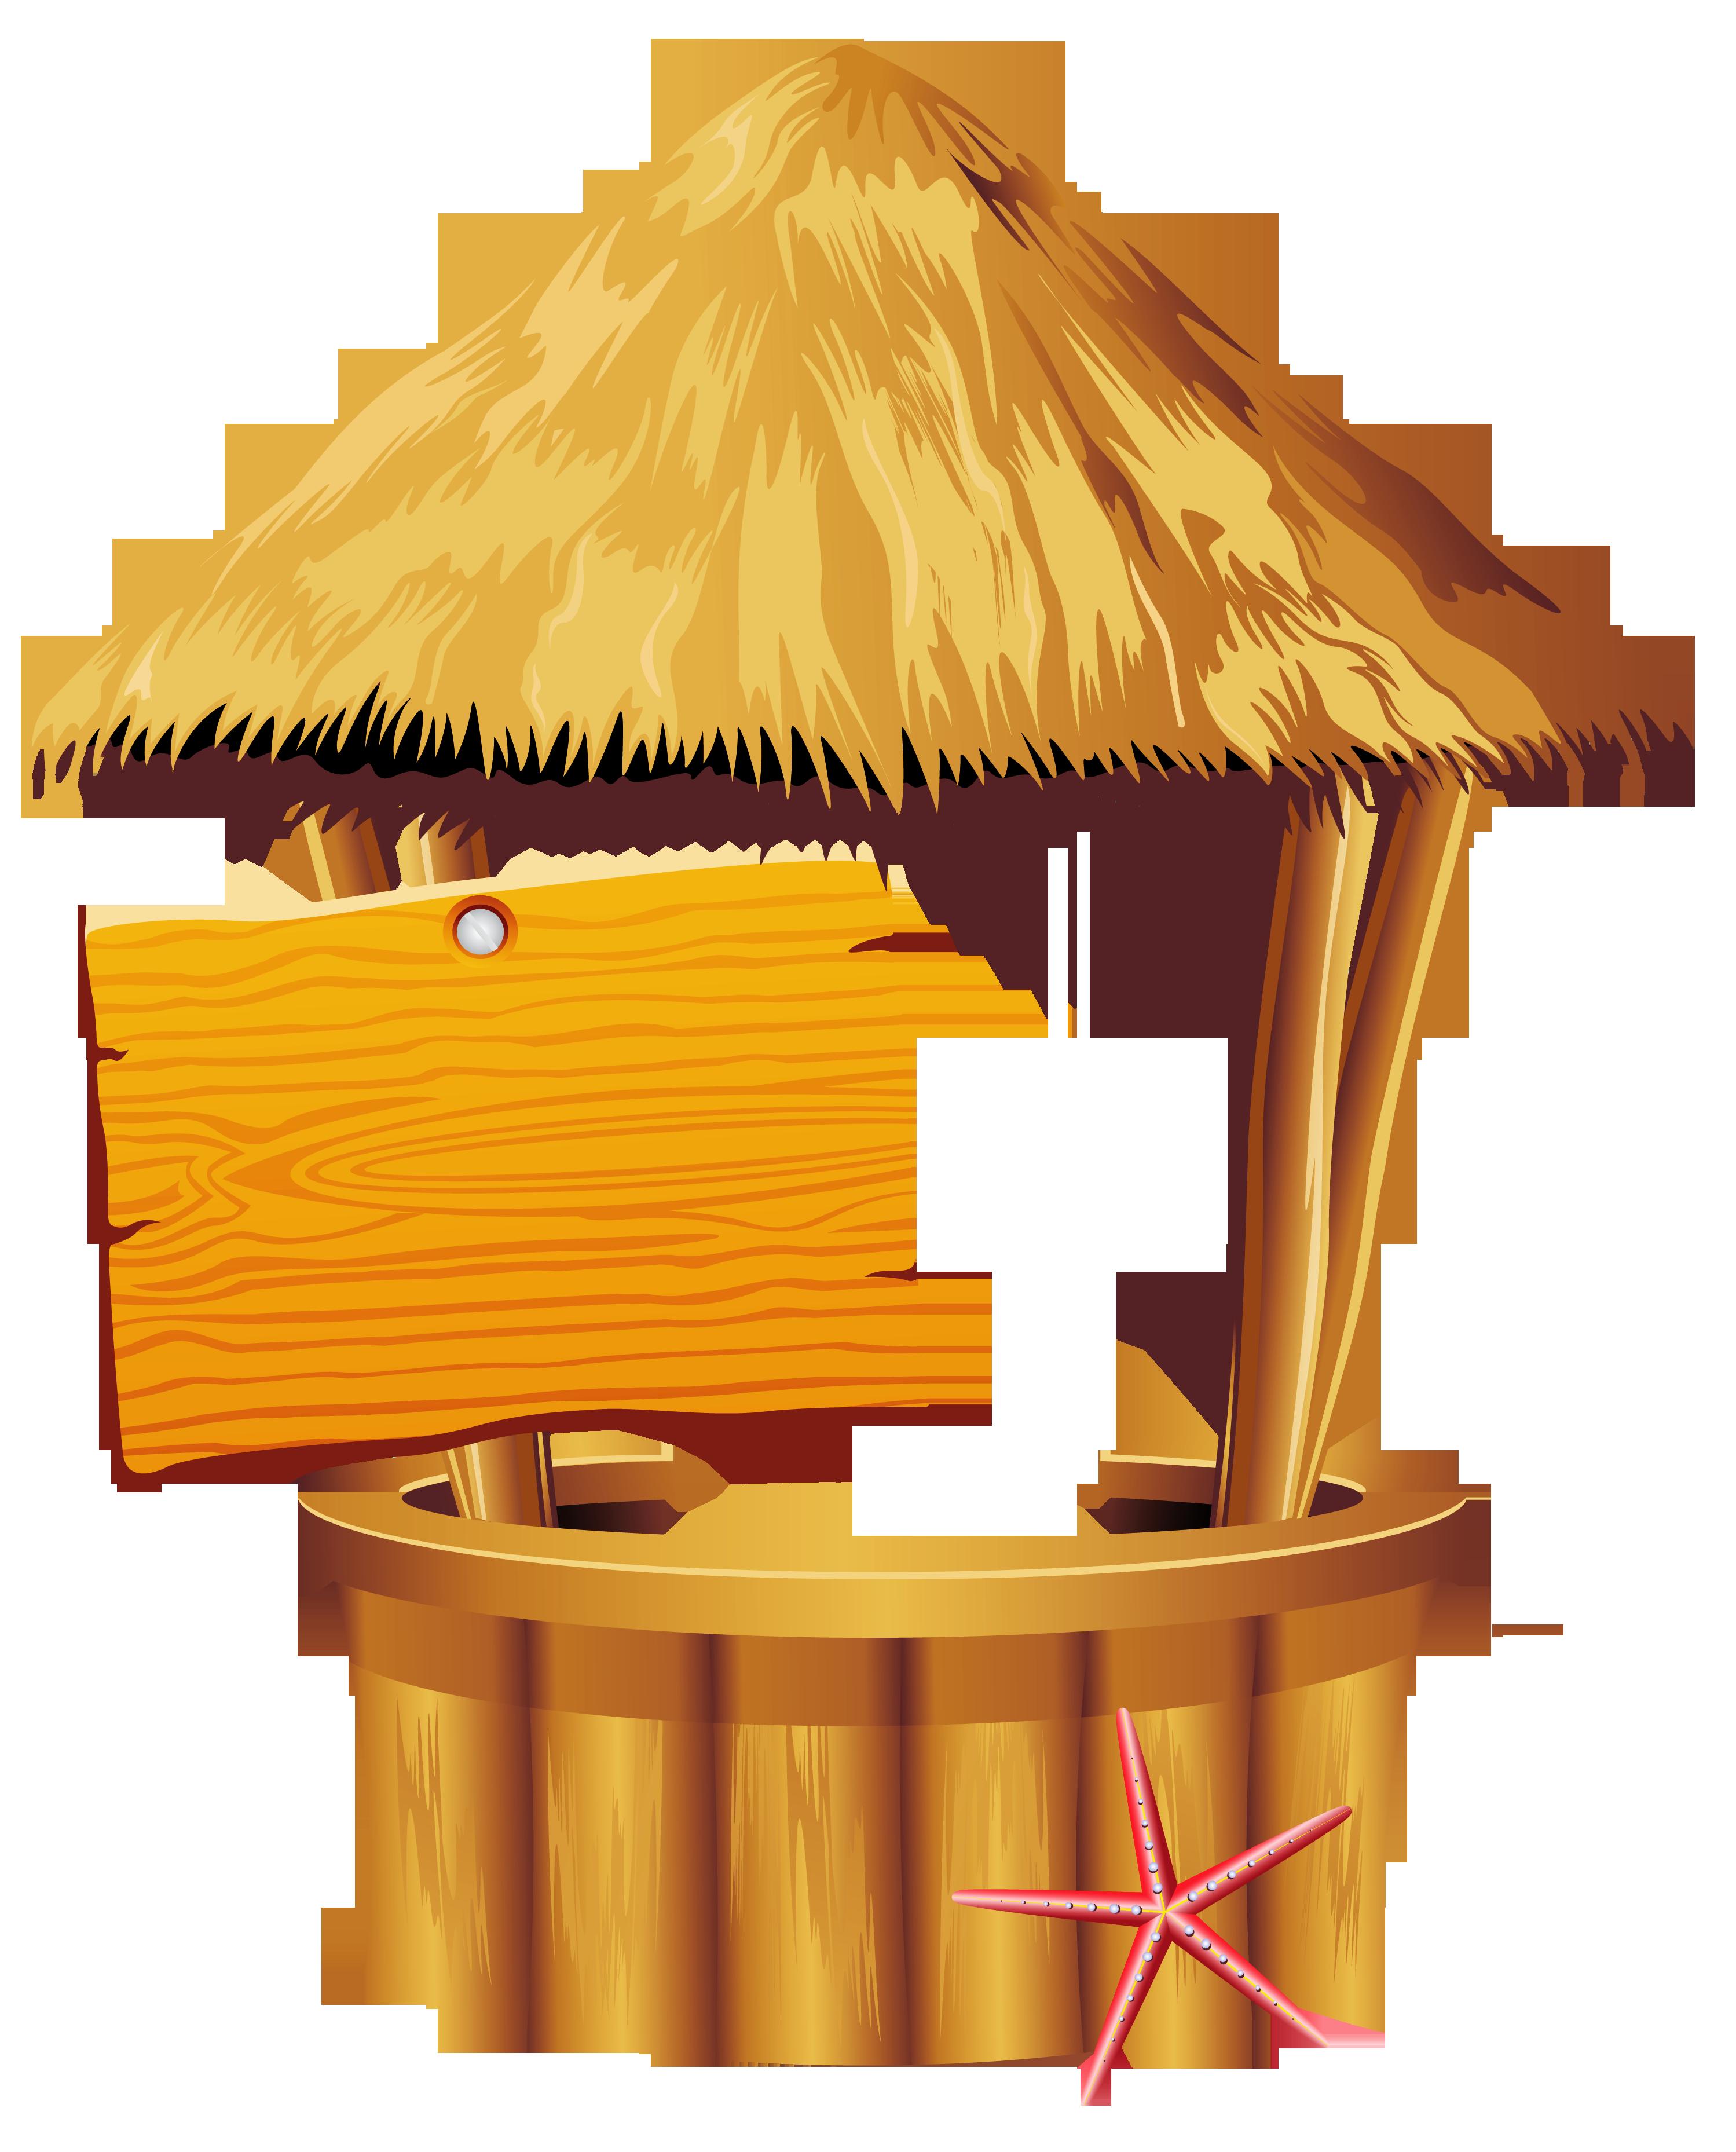 png library download Hawaiian beach bar png. Tiki clipart tiki drink